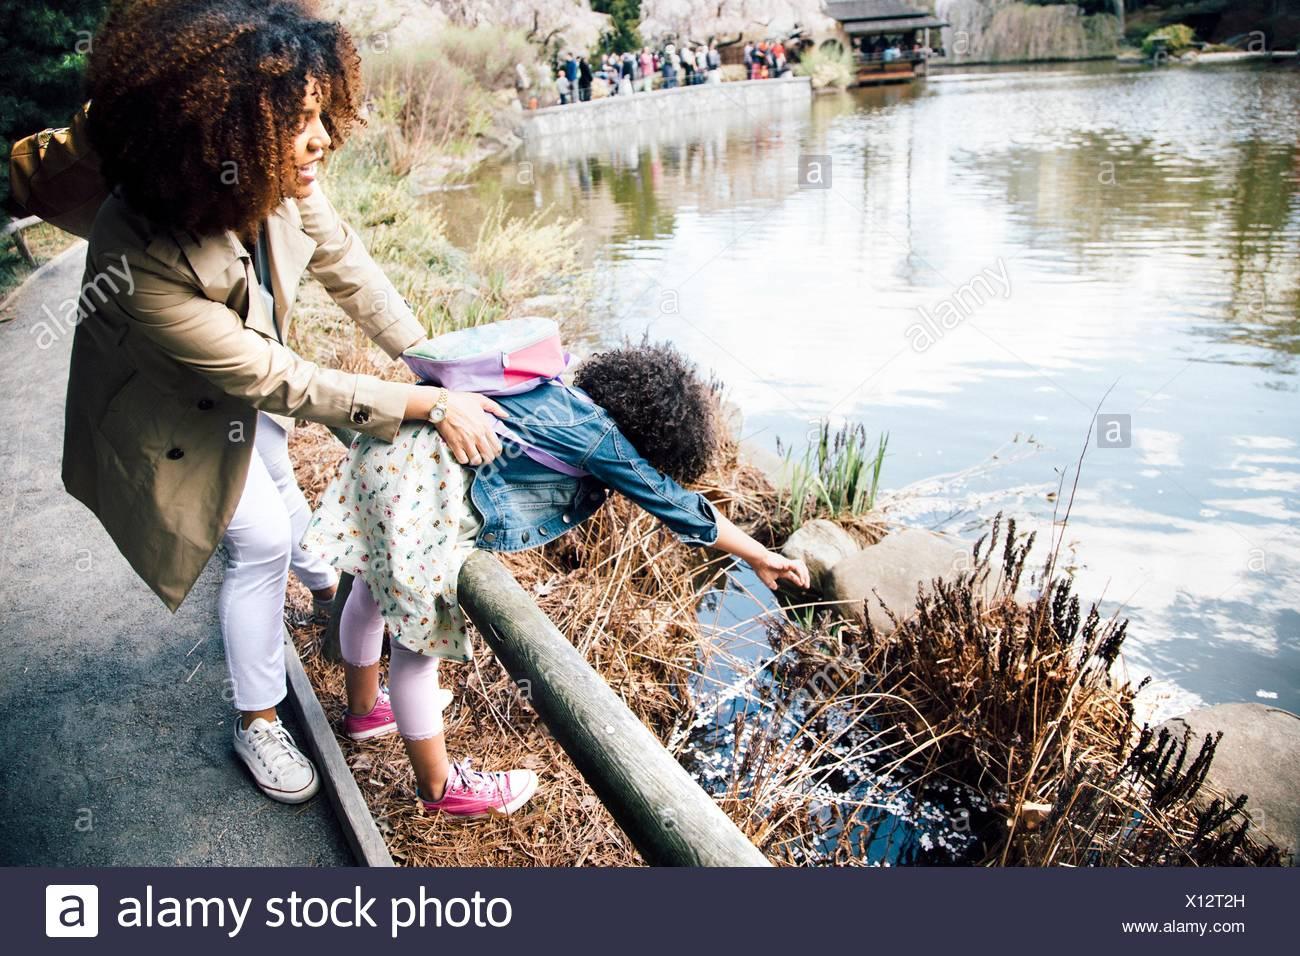 Madre Hija de agarre se extiende en la barandilla para tocar plant Imagen De Stock